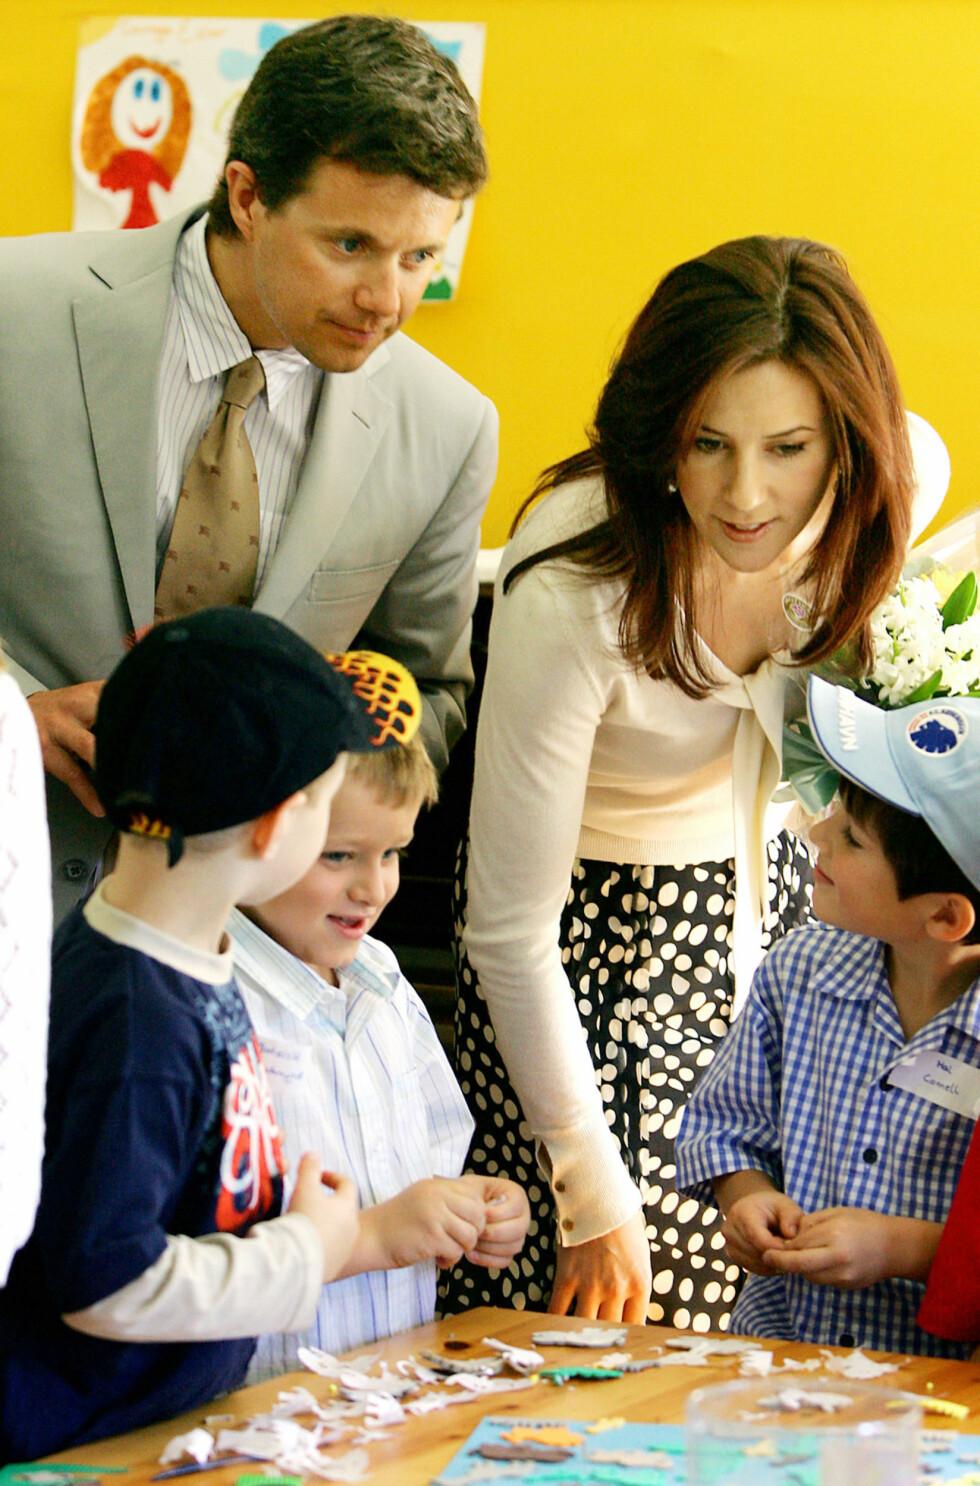 I SYDNEY: Kronprins Frederik og kona kronprinsesse Mary under et besøk ved en søndagsskole i en dansk kirke i Sydney, Australia, i 2005. Foto: NTB Scanpix